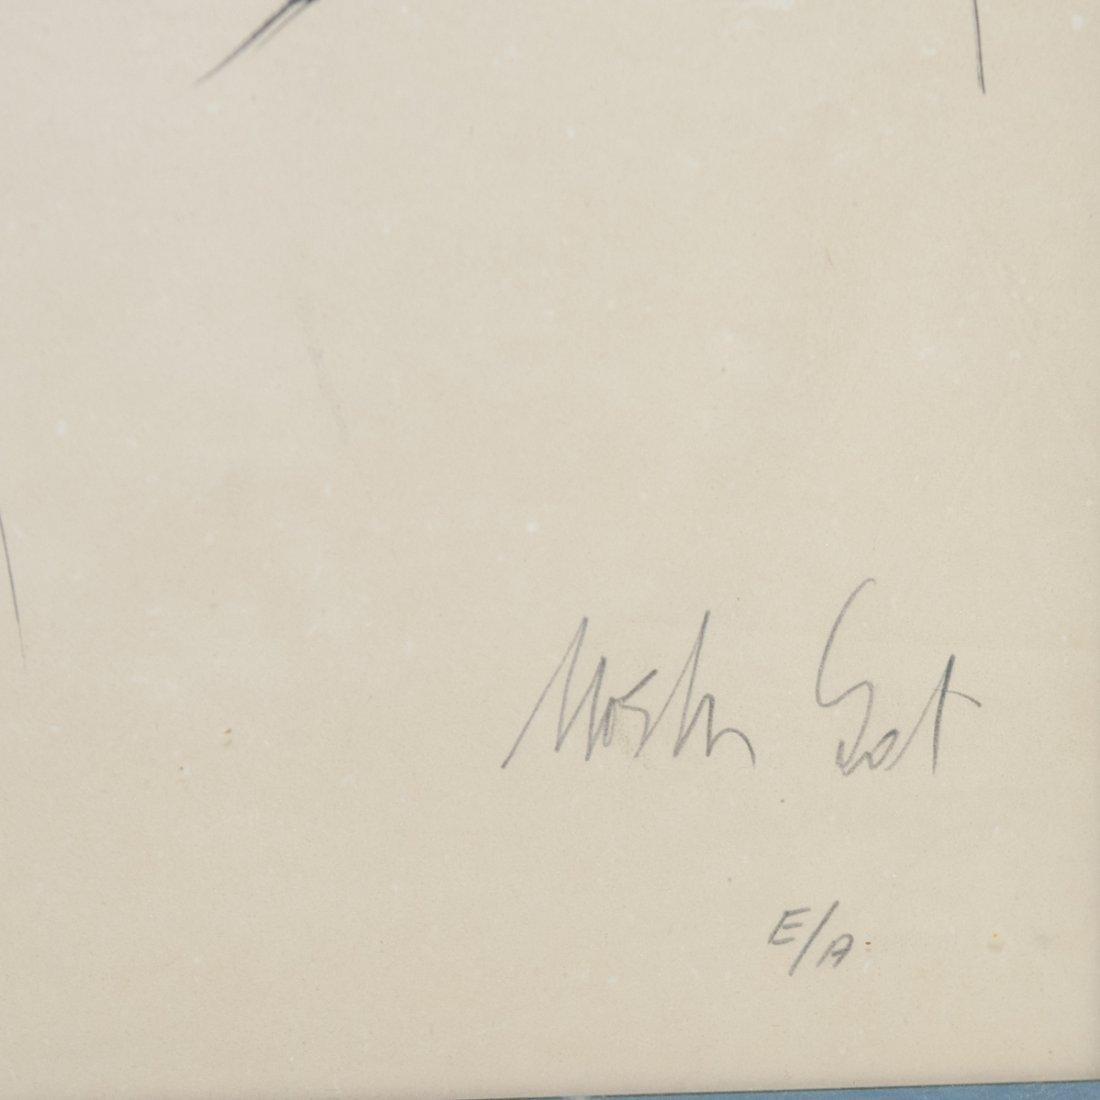 Moshe Gat (Israel b. 1935) Artist Proof - 3